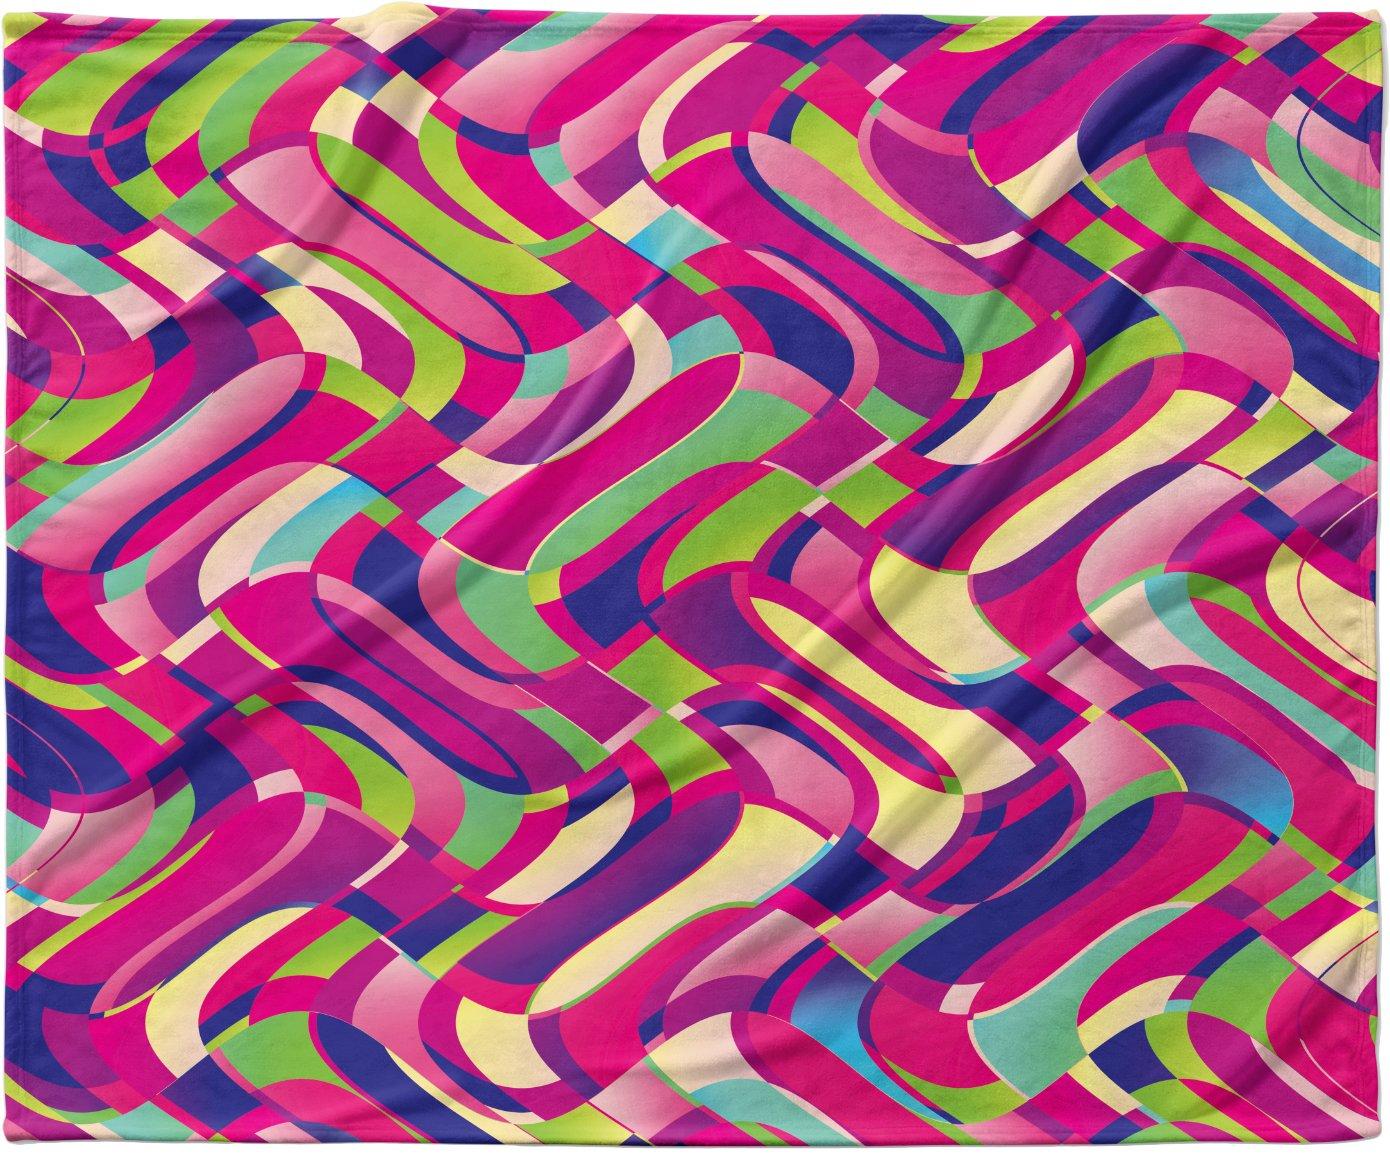 40 x 30 KESS InHouse Dawid Roc Colorful Movement Pink Abstract Fleece Baby Blanket